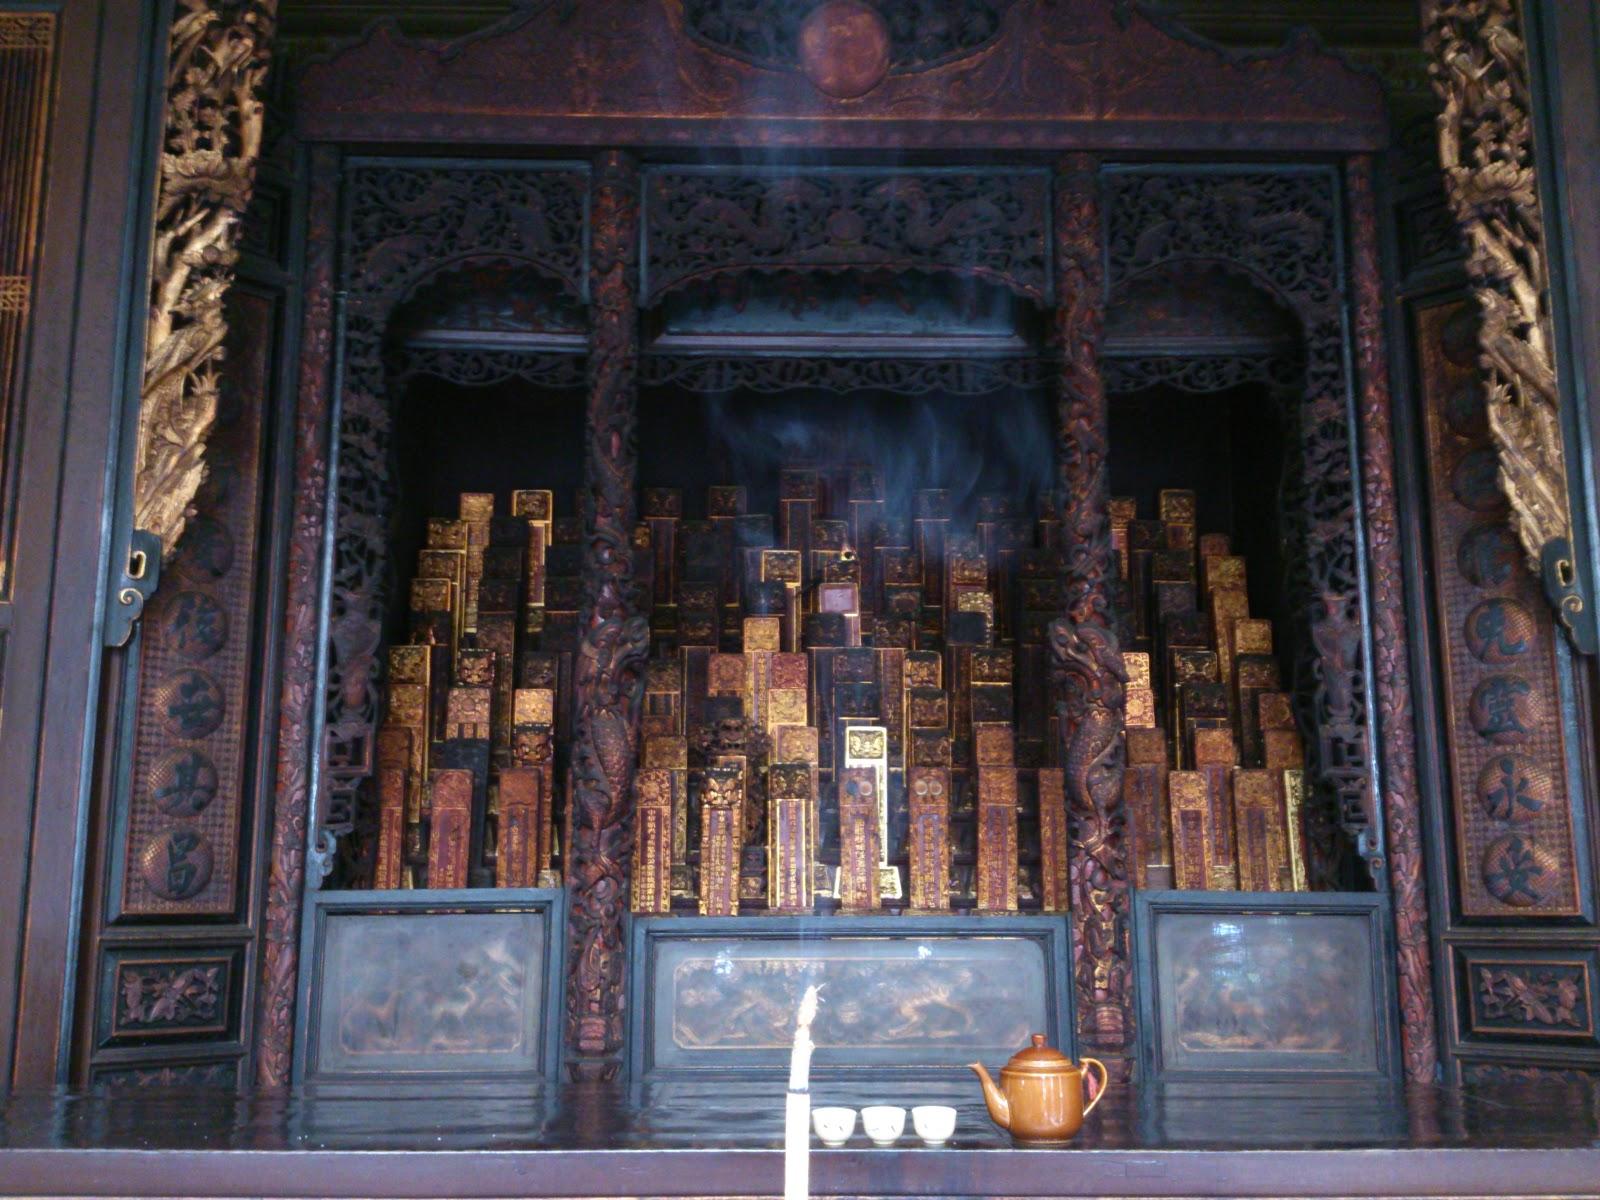 monson buddhist singles (president thomas s monson, april 21, 2009) schools served: cameron university.